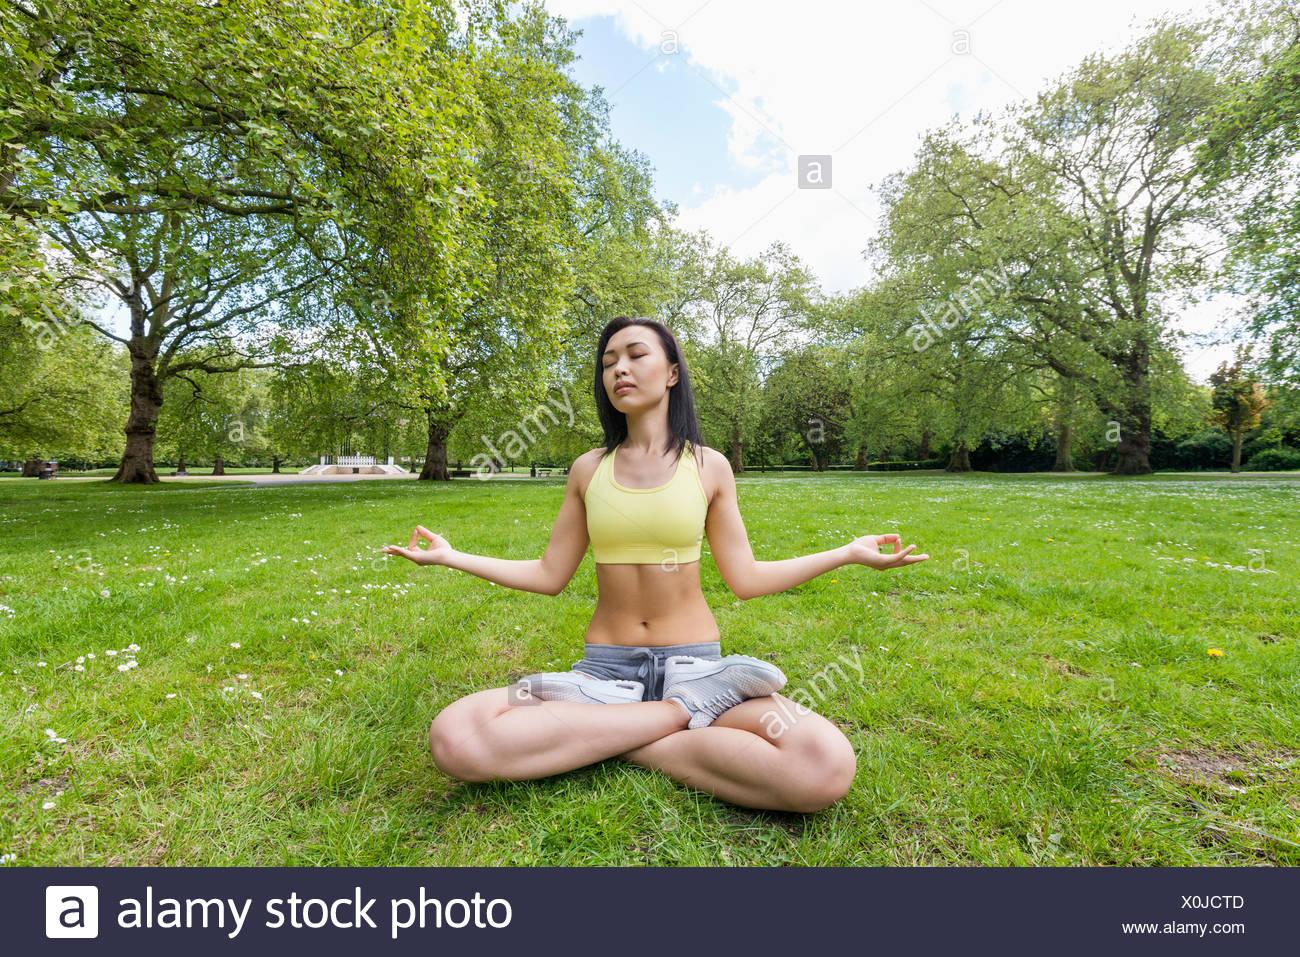 Full length of beautiful fit woman performing yoga at park - Stock Image